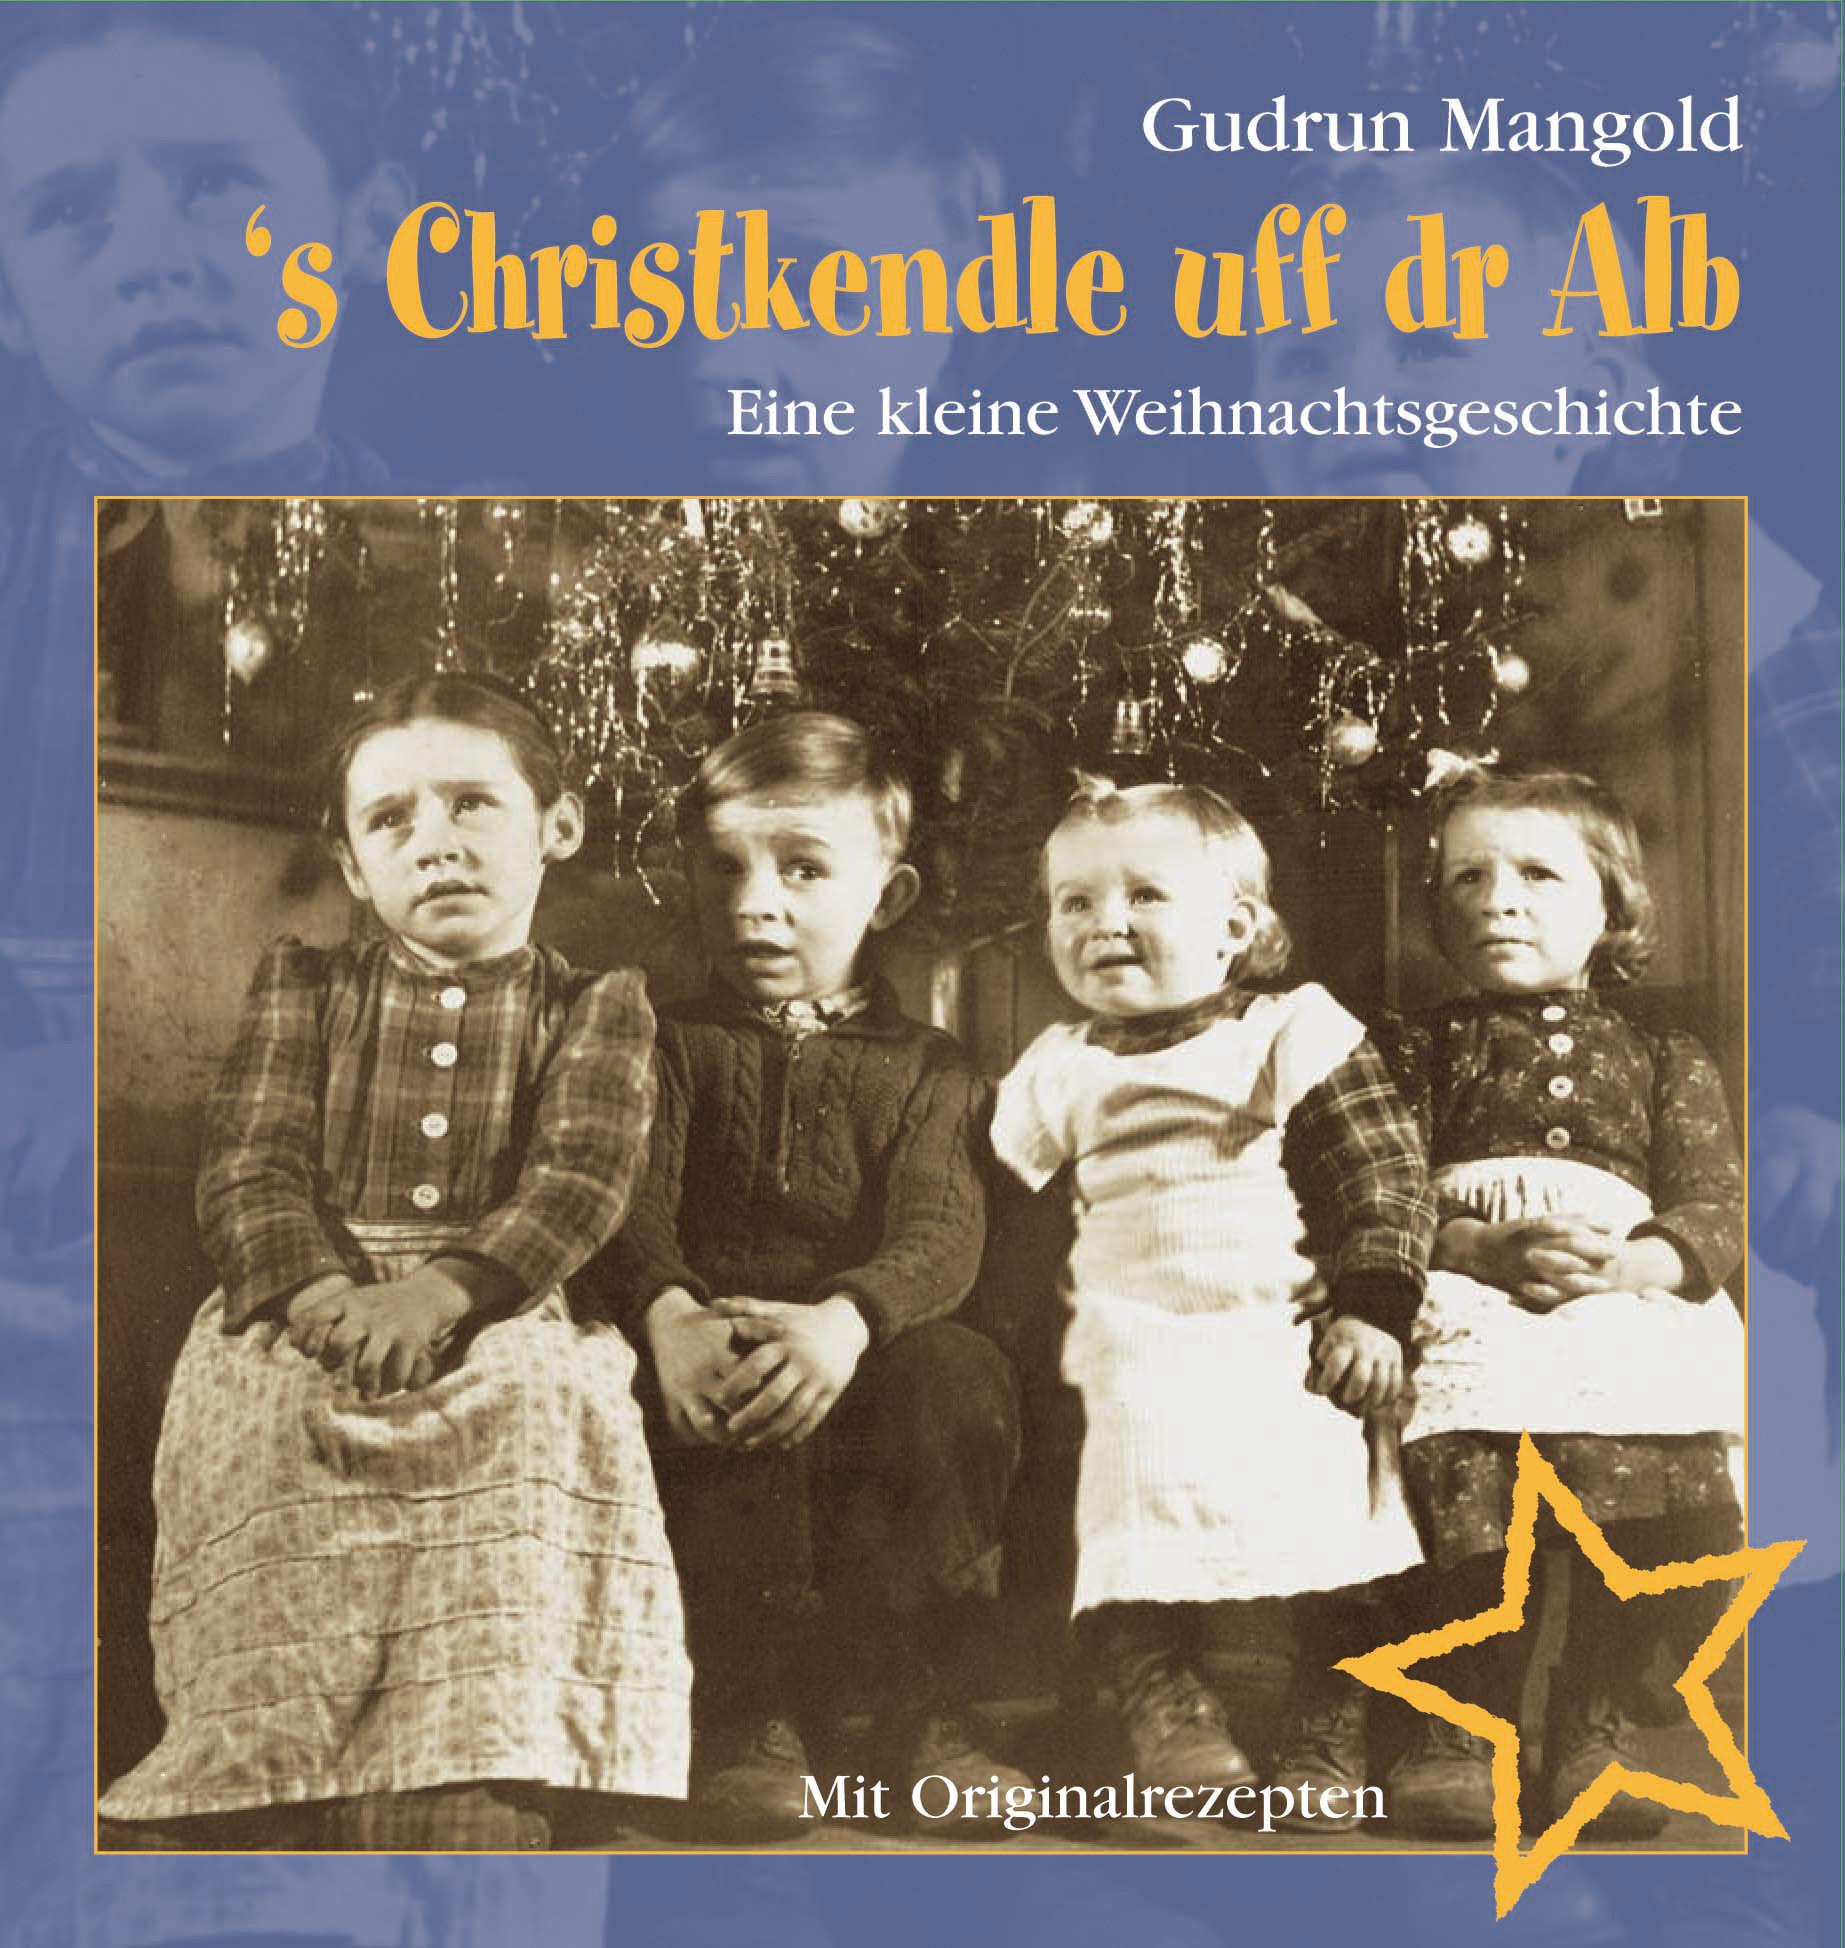 's Christkendle uff dr Alb Gudrun Mangold